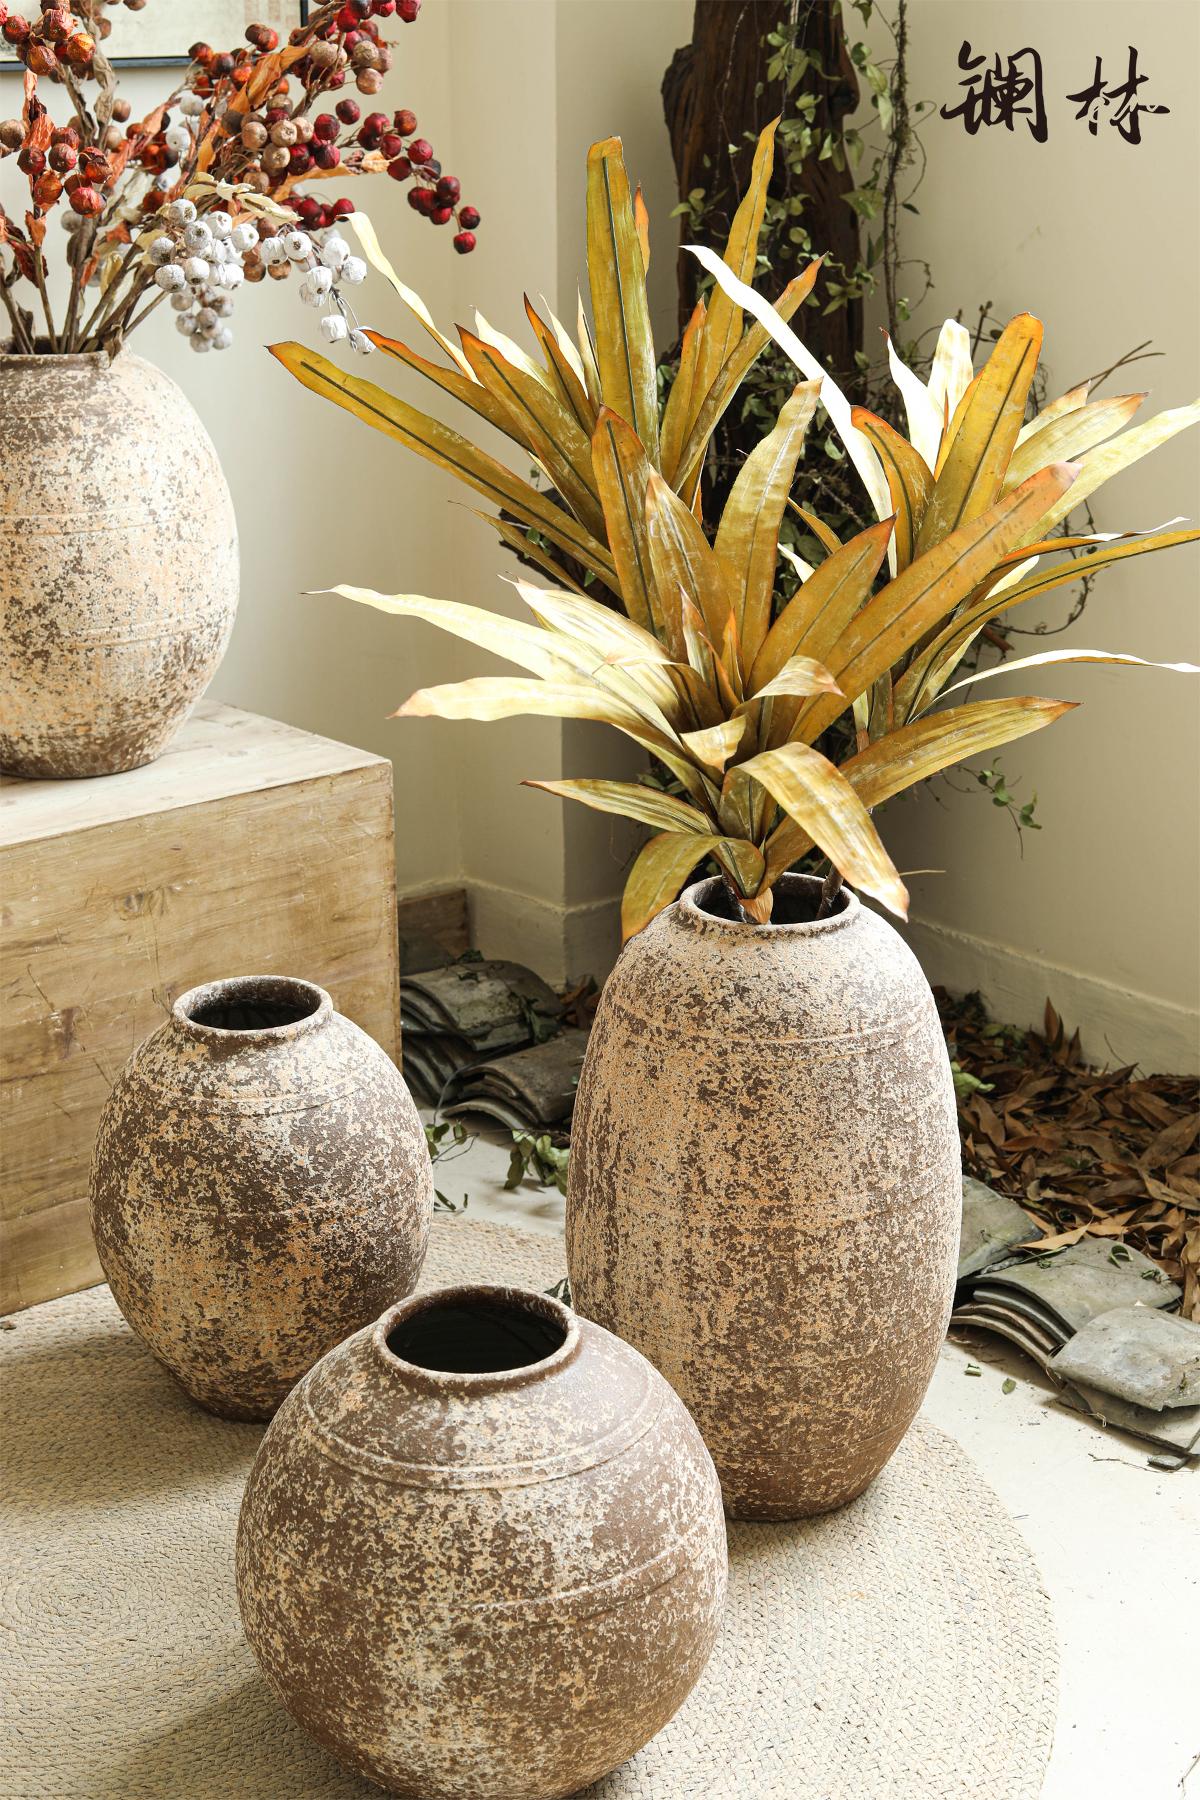 Simulation of plant leaves restoring ancient ways do old zen put POTS dry flower adornment wabi-sabi wind b&b hotel floral furnishing articles